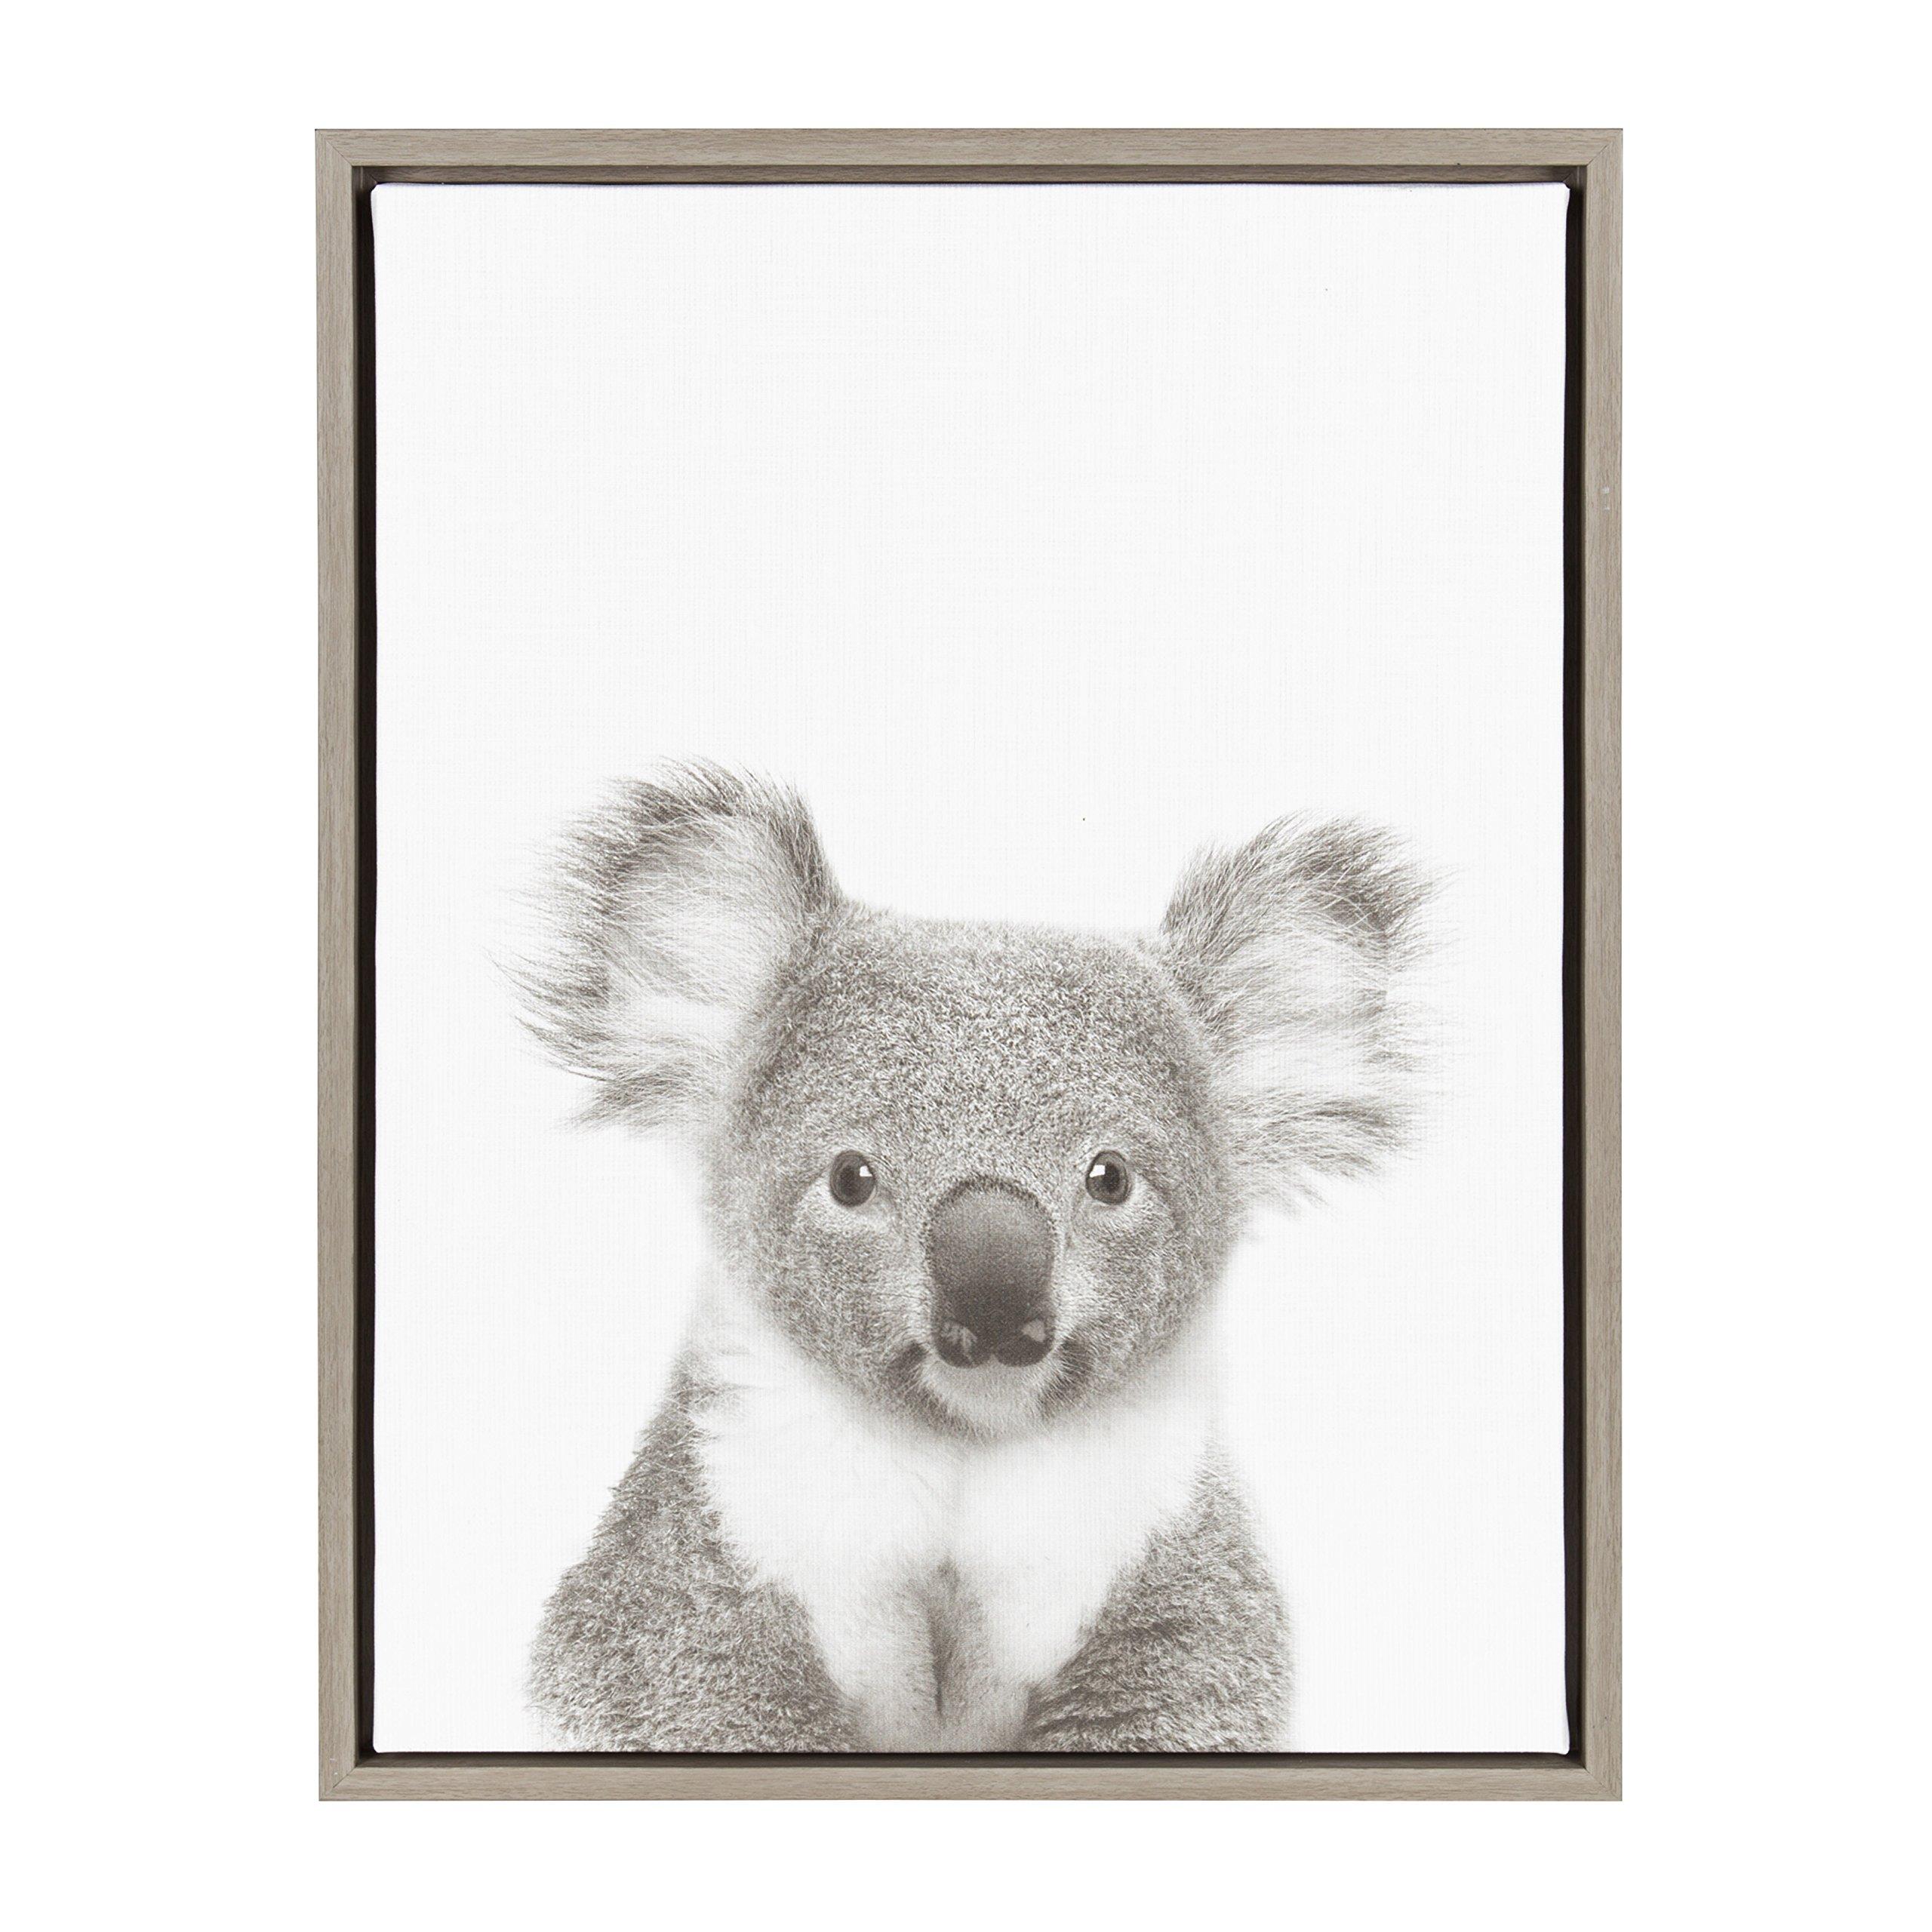 Kate and Laurel - Sylvie Koala Animal Print Black and White Framed Canvas Wall Art by Simon Te Tai, Gray 18x24